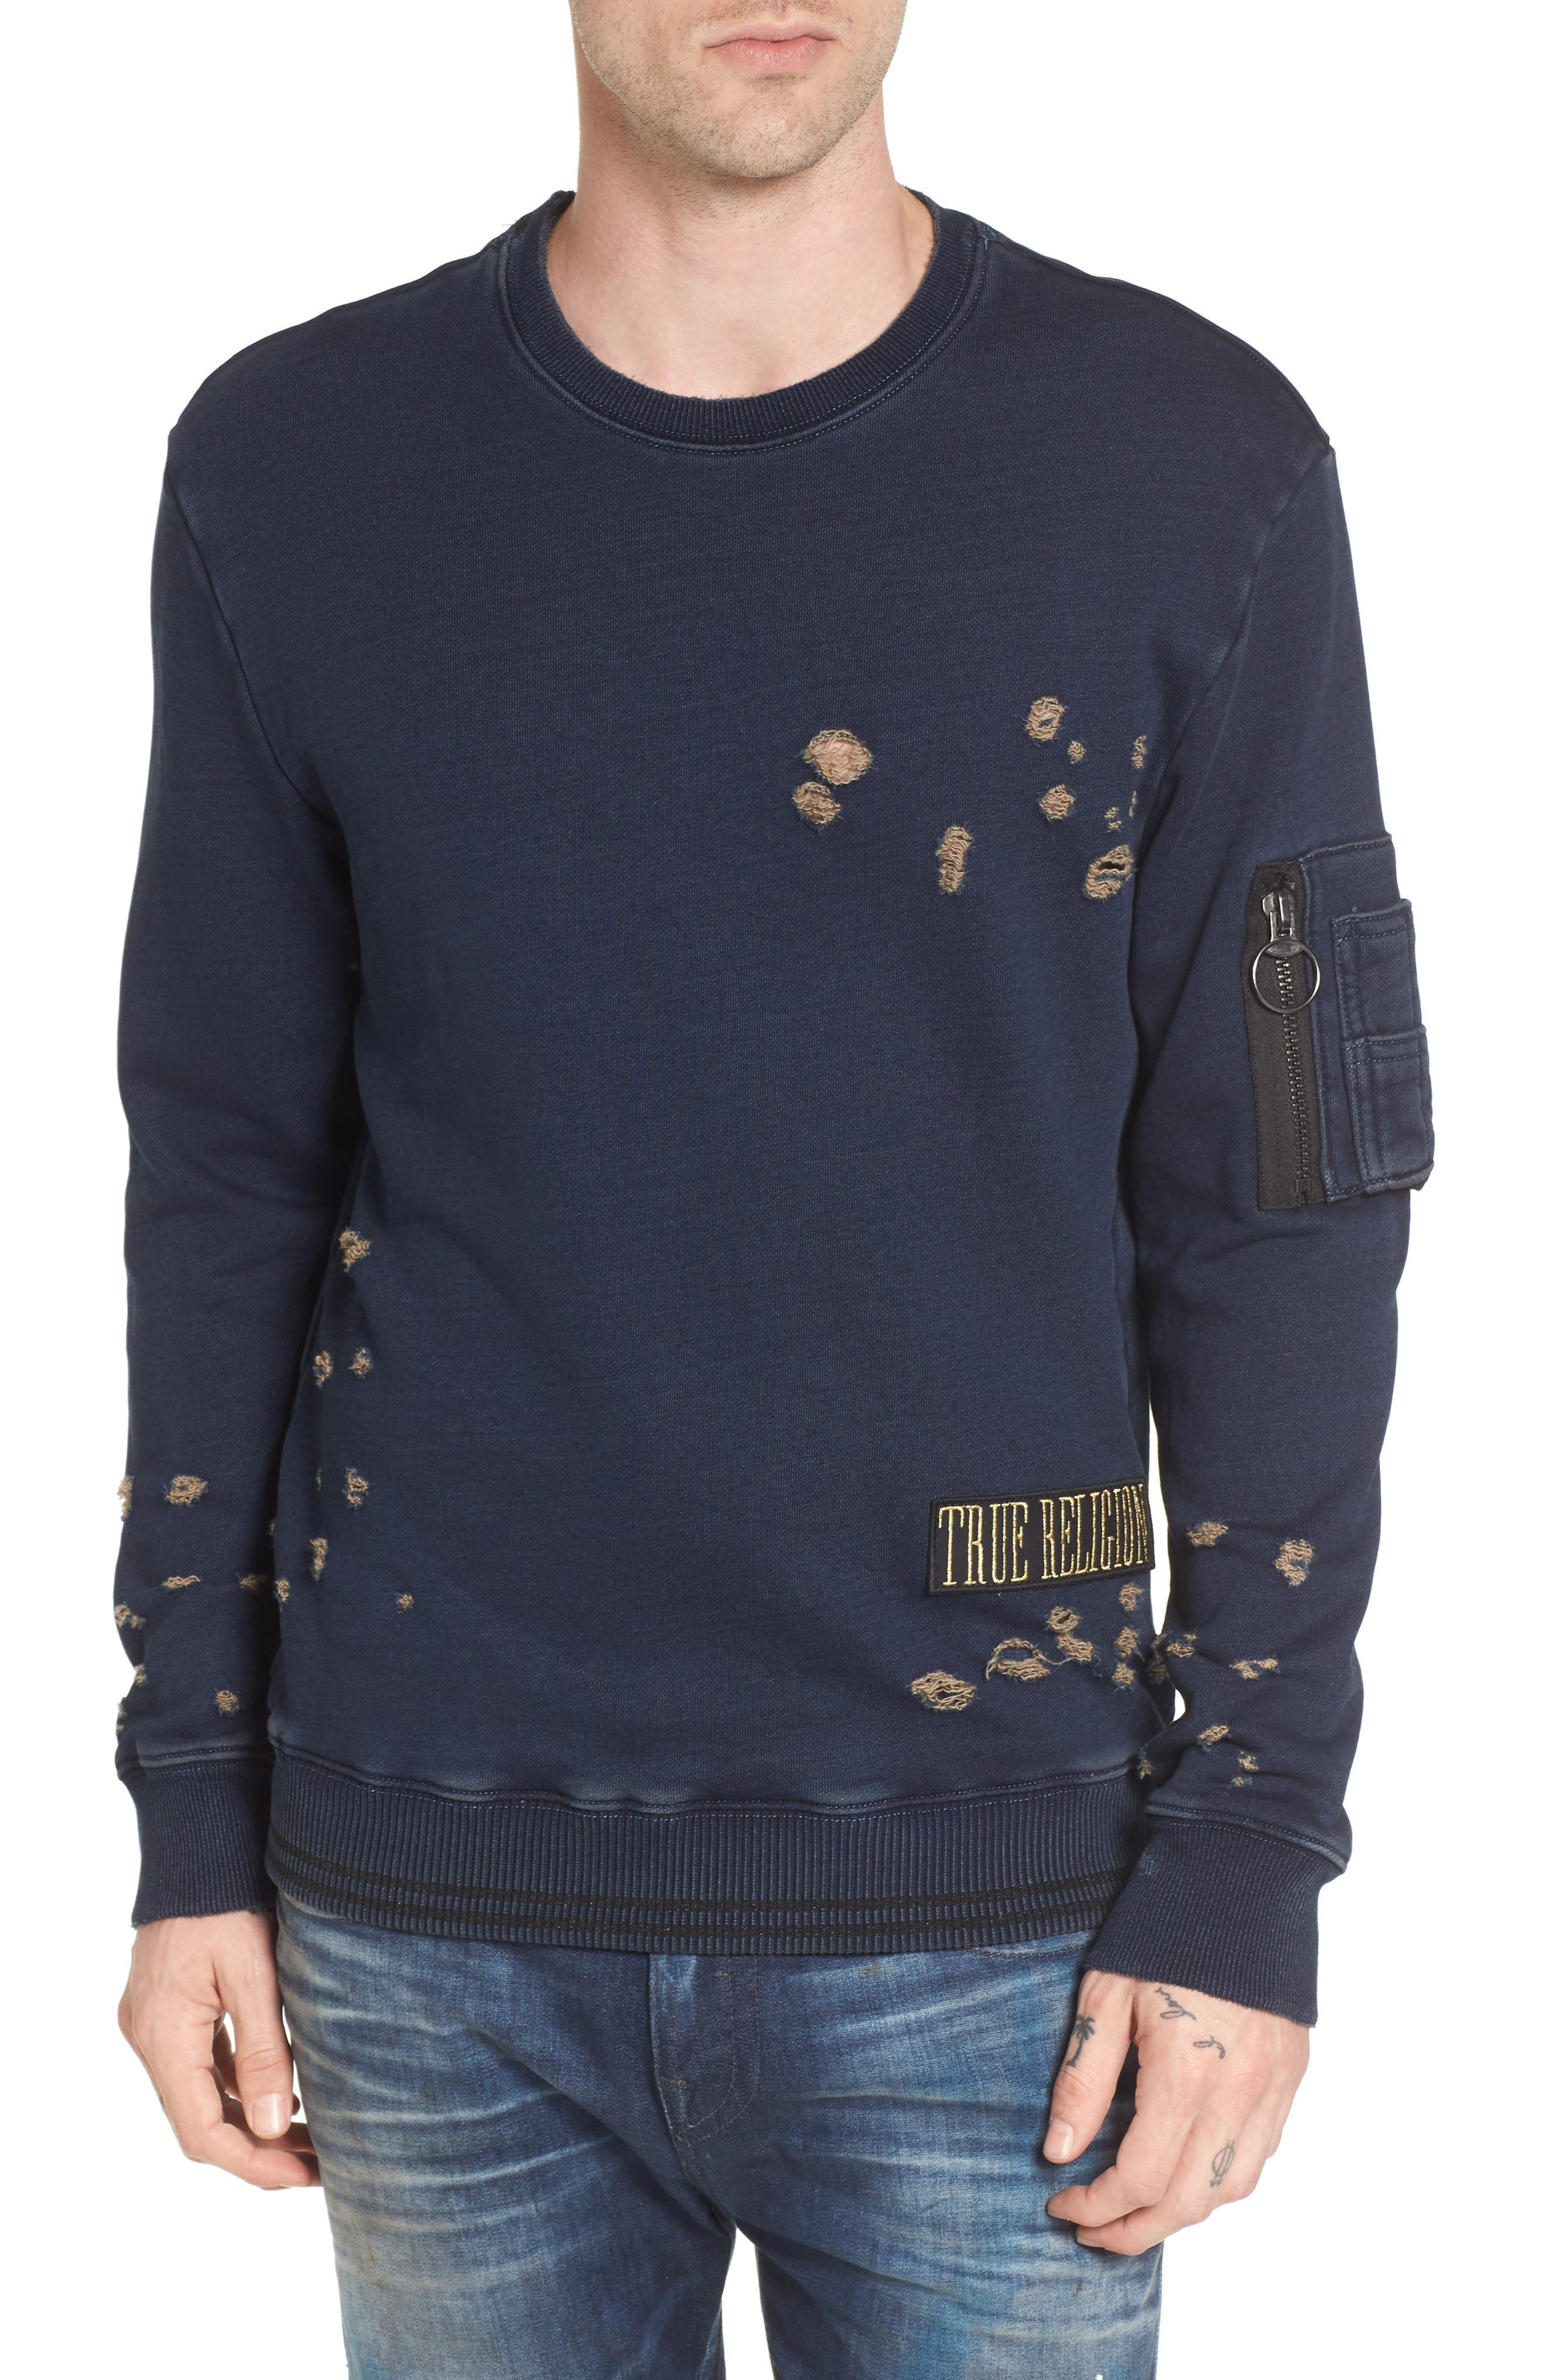 Main Image - True Religion Brand Jeans Distressed Sweatshirt